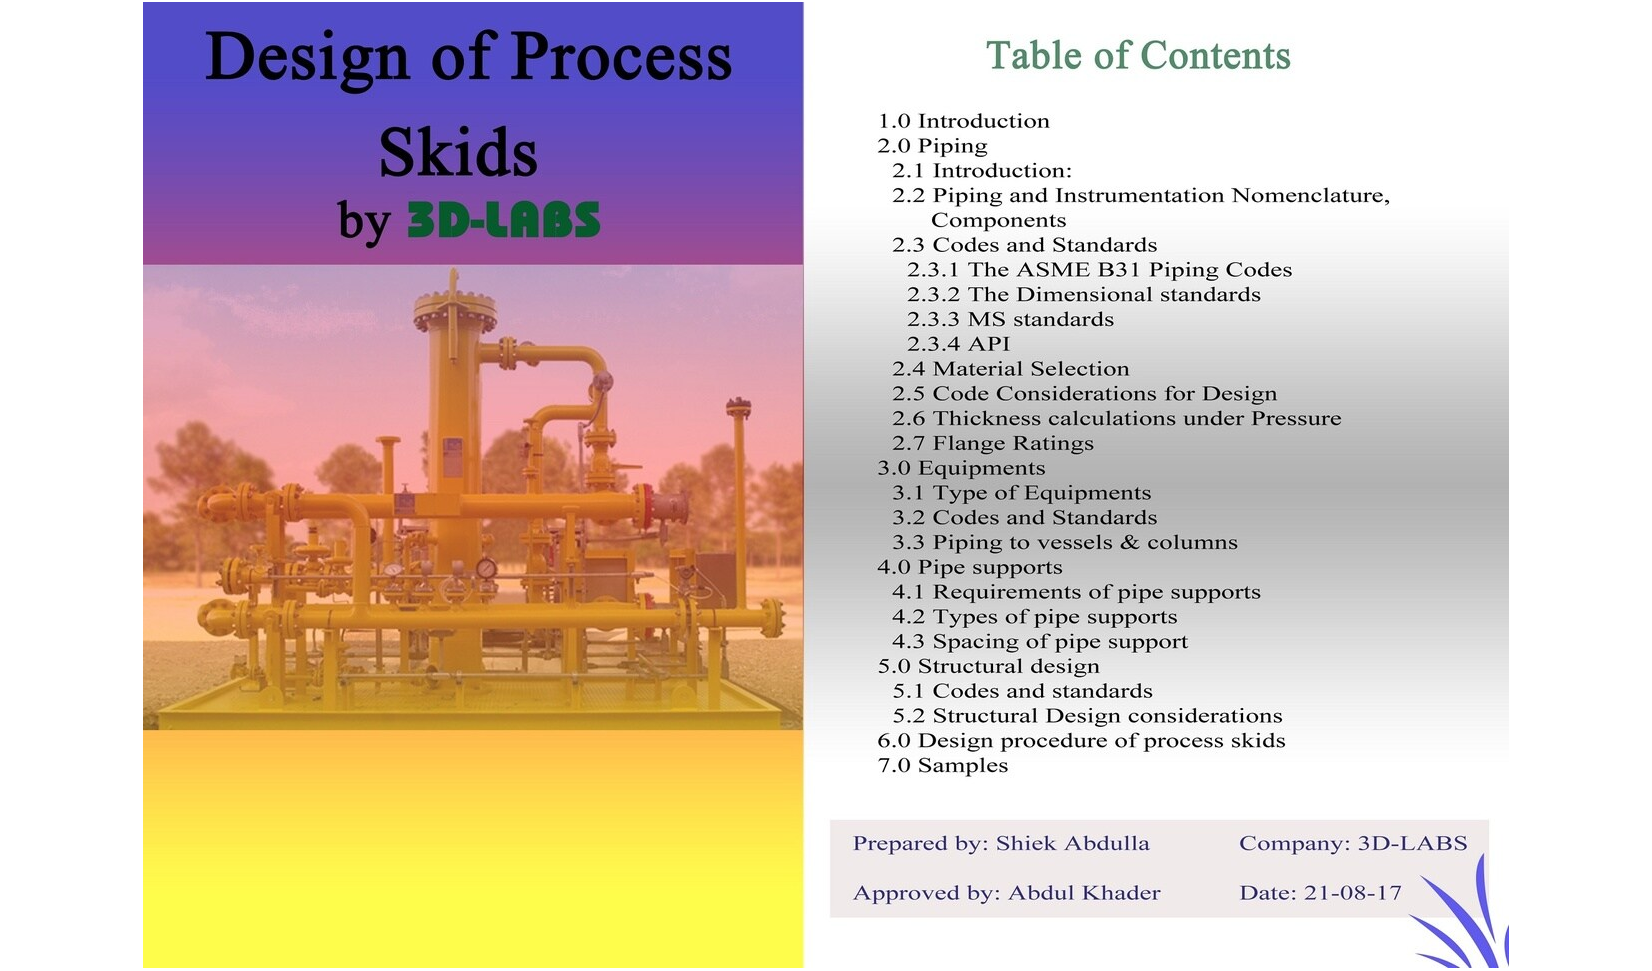 Design process of skid